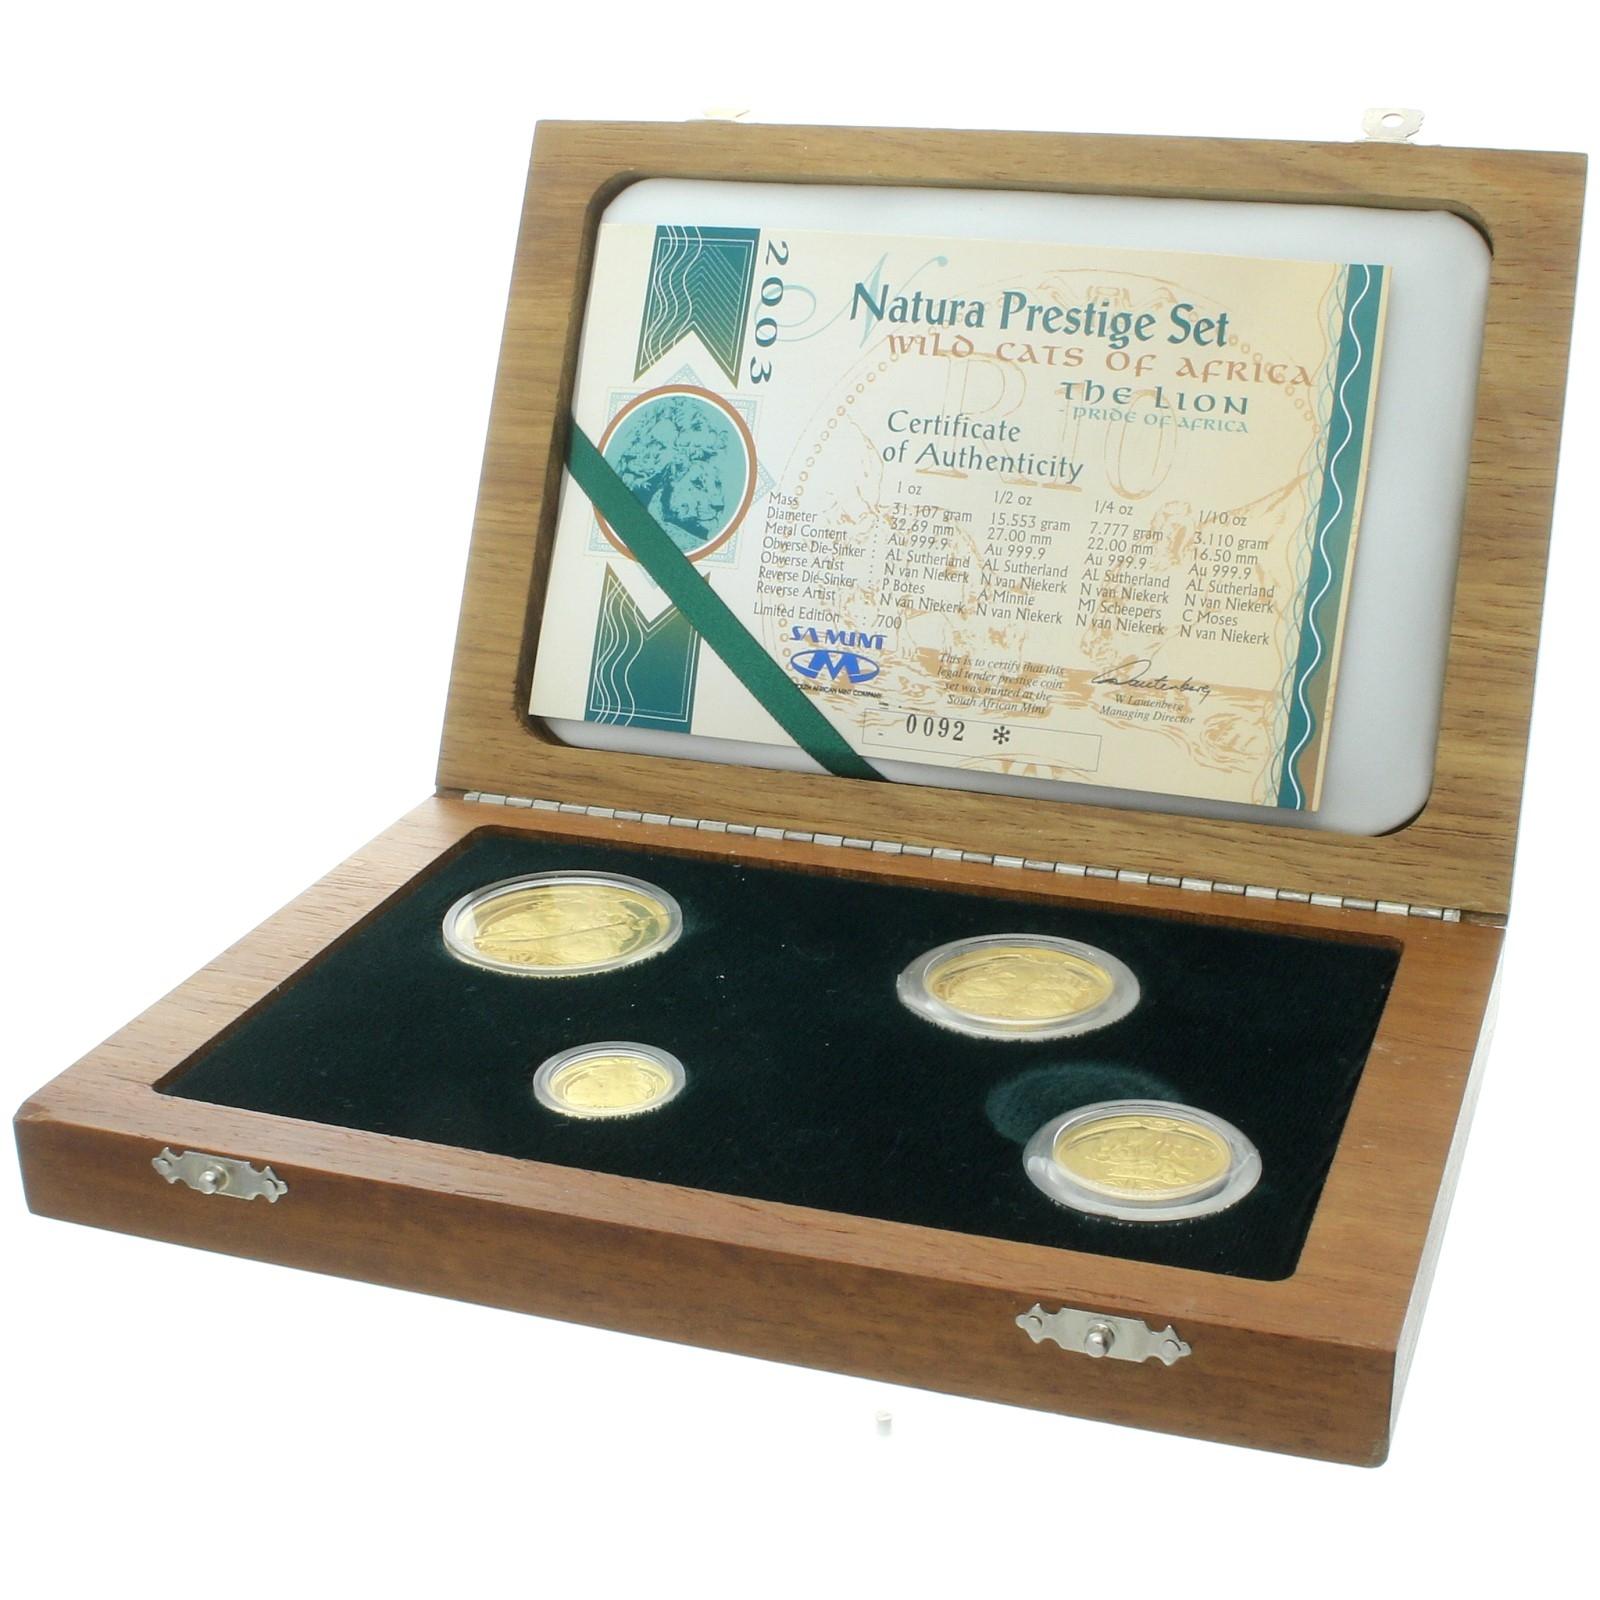 South Africa - 2003 - 10 rand/100 rand - Prestige set - Natura - 1.85 oz